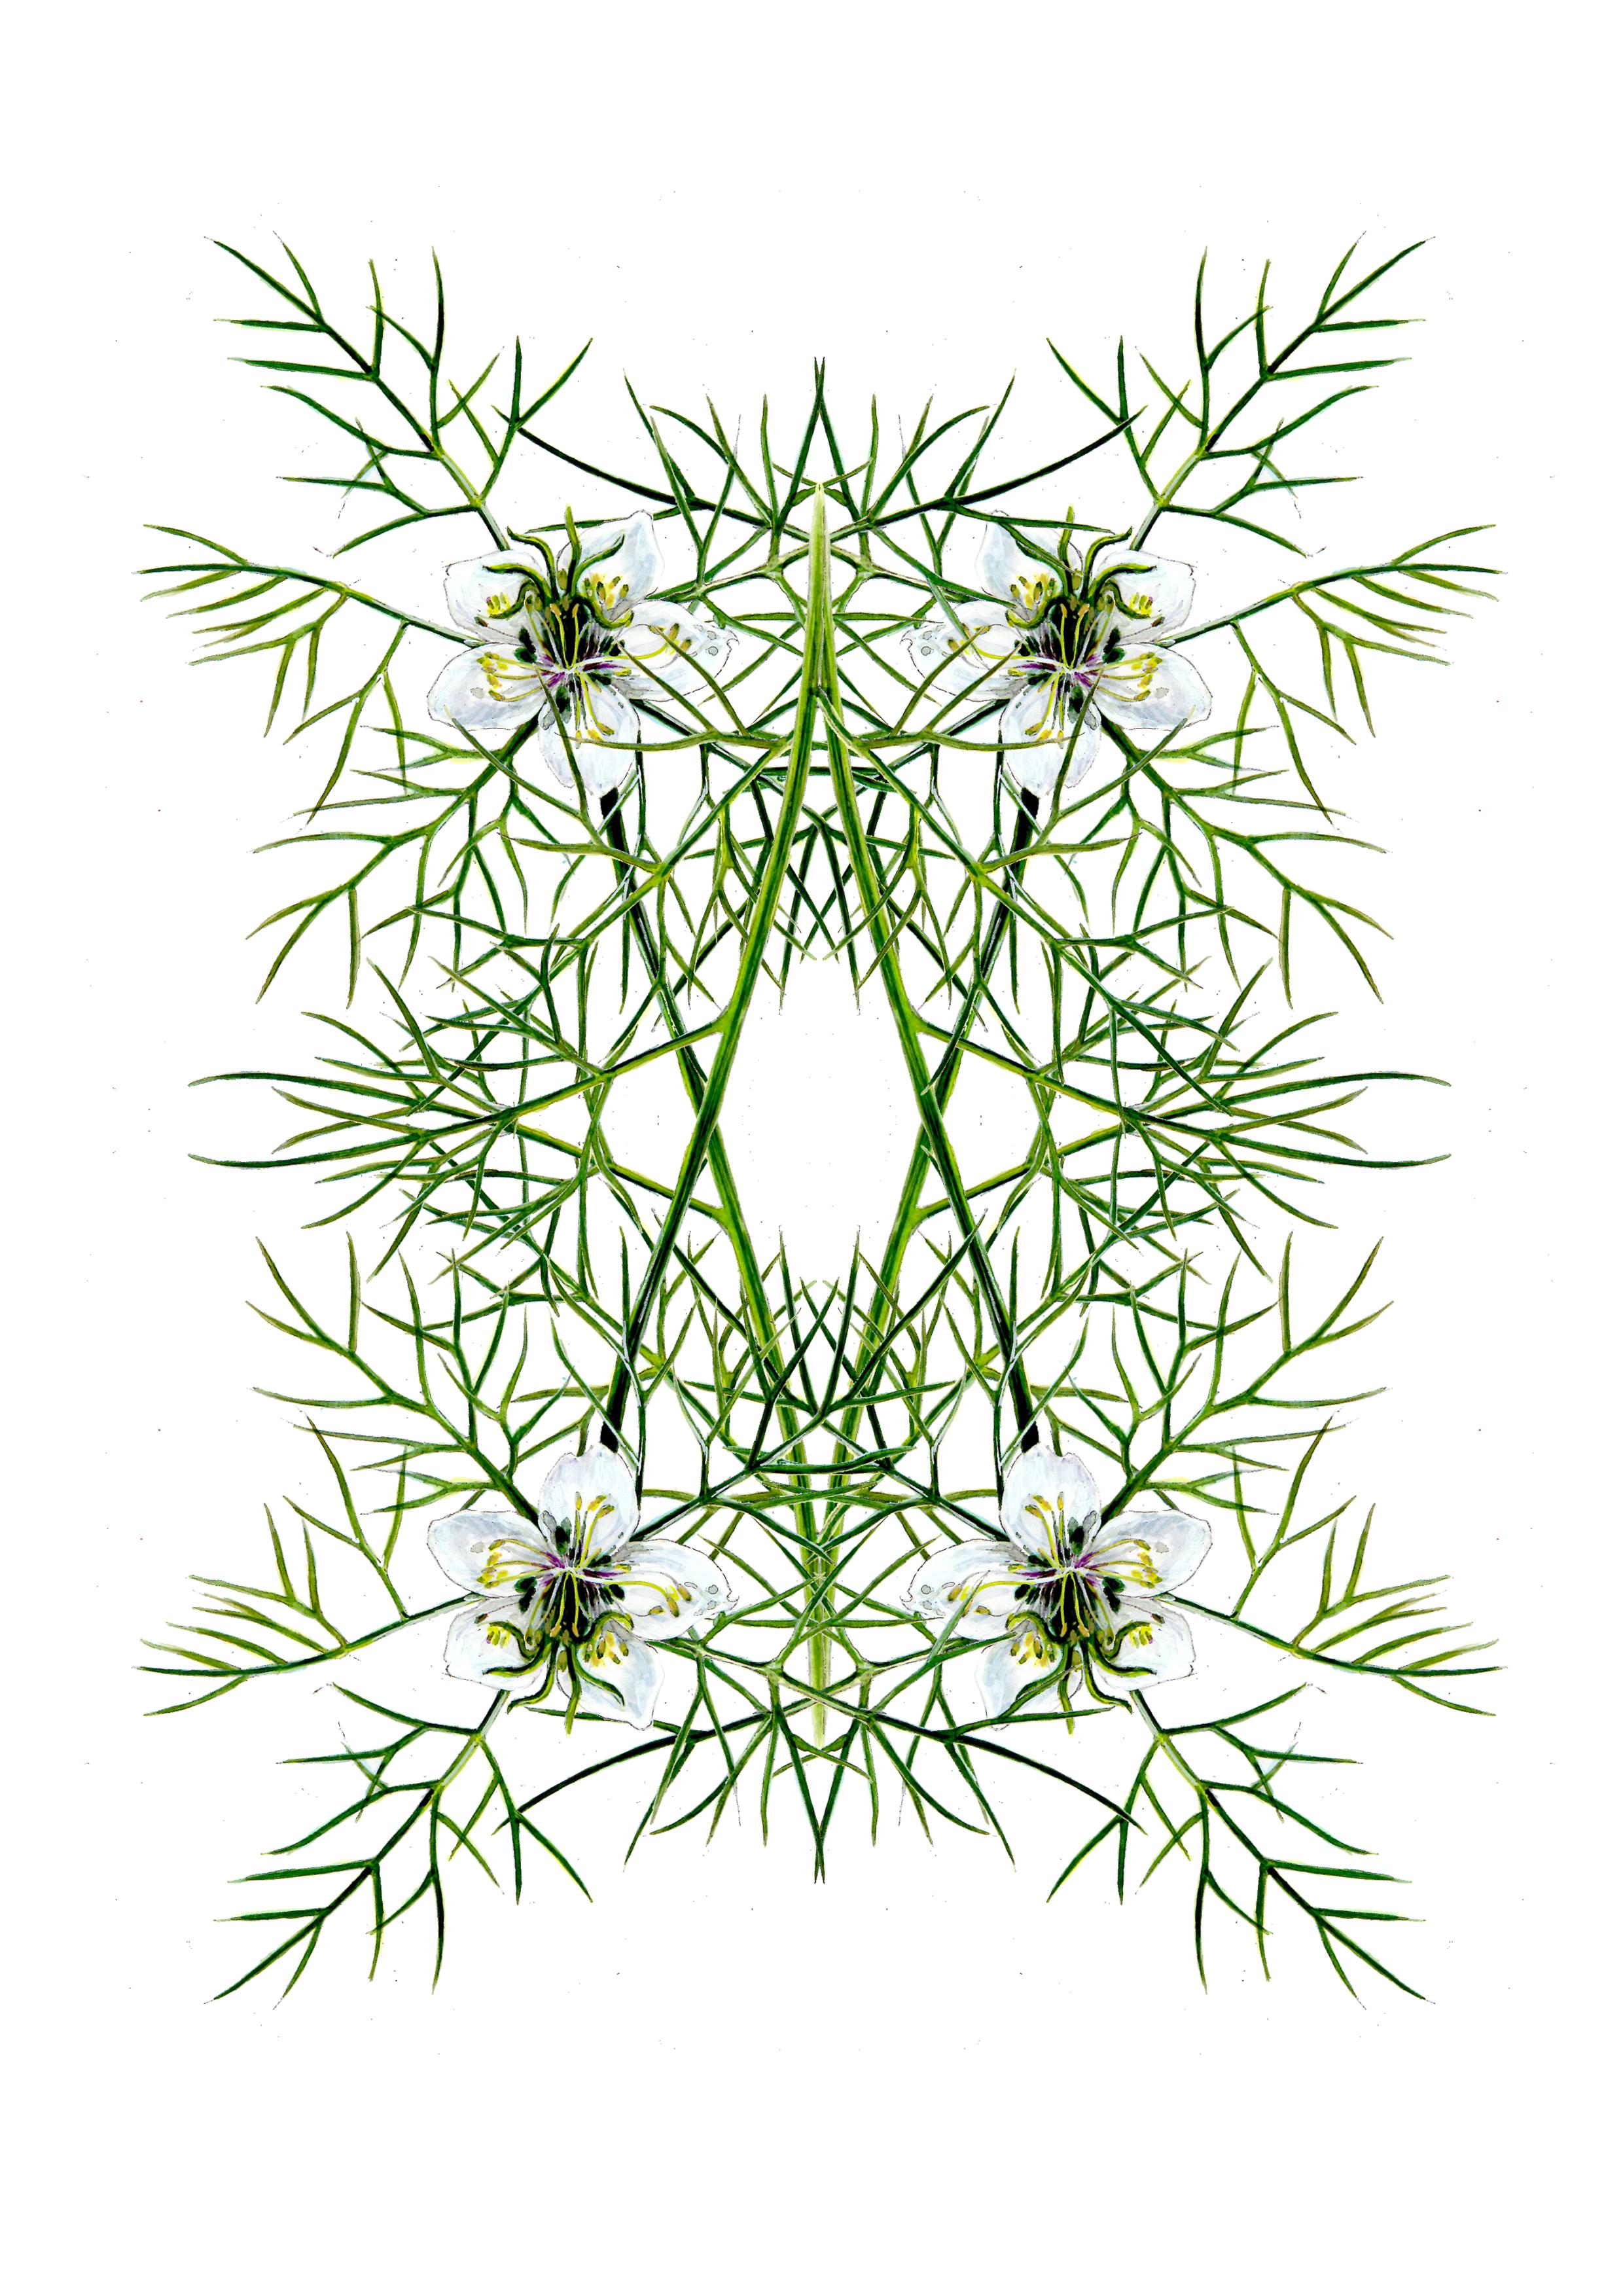 plants53